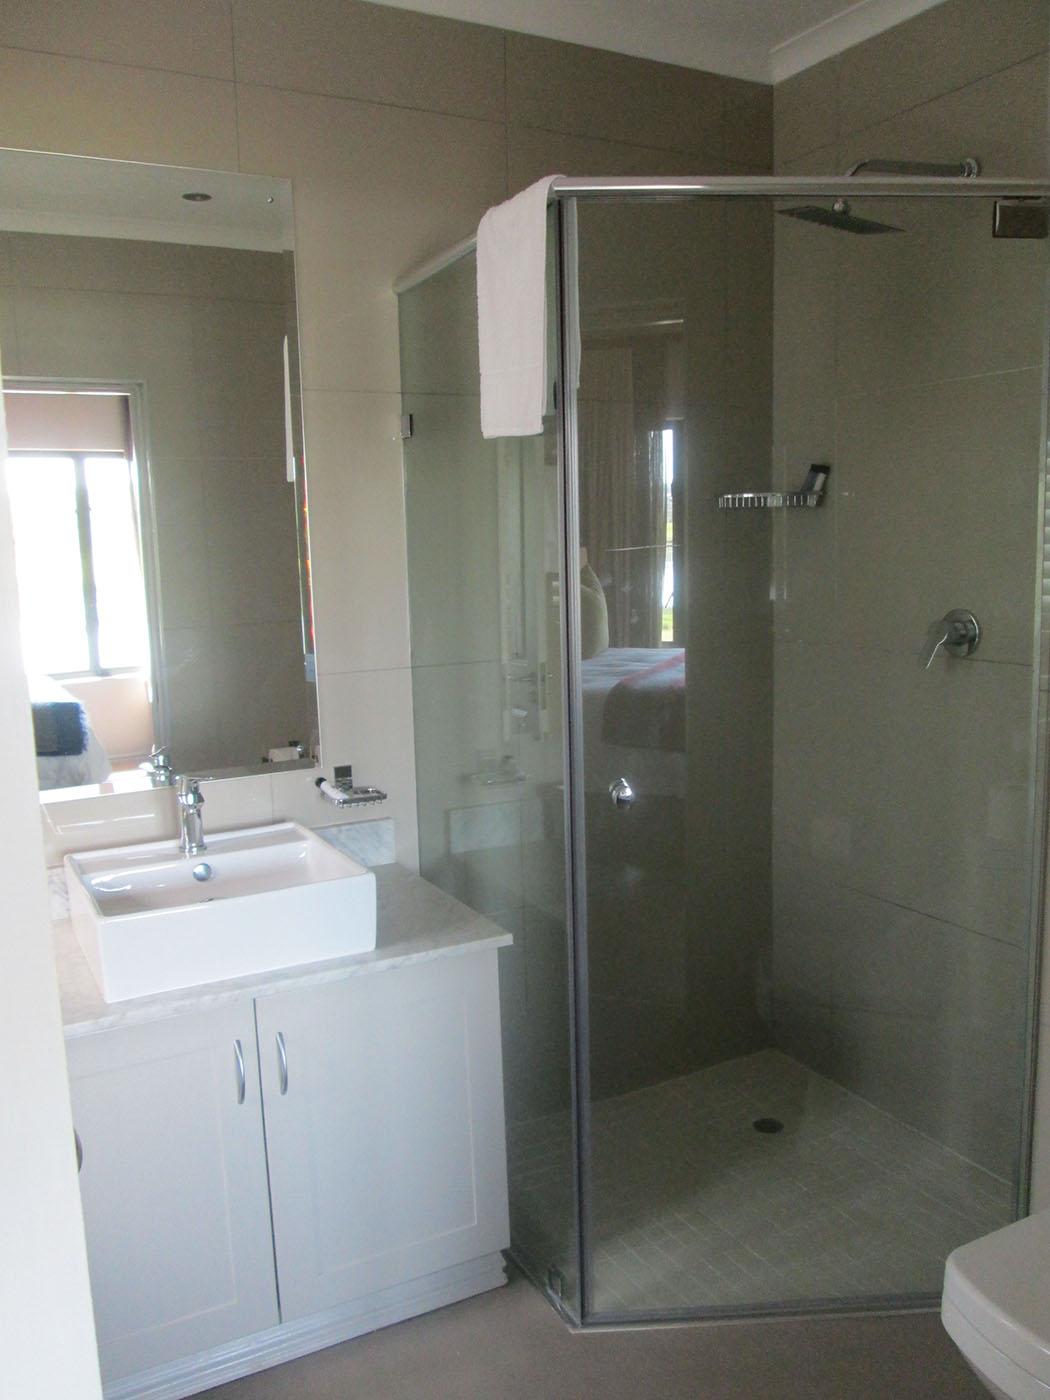 18th-hole-rooms-accommodation-drakensberg-midlands-Nottingham-Road-kzn-gowrie-farm